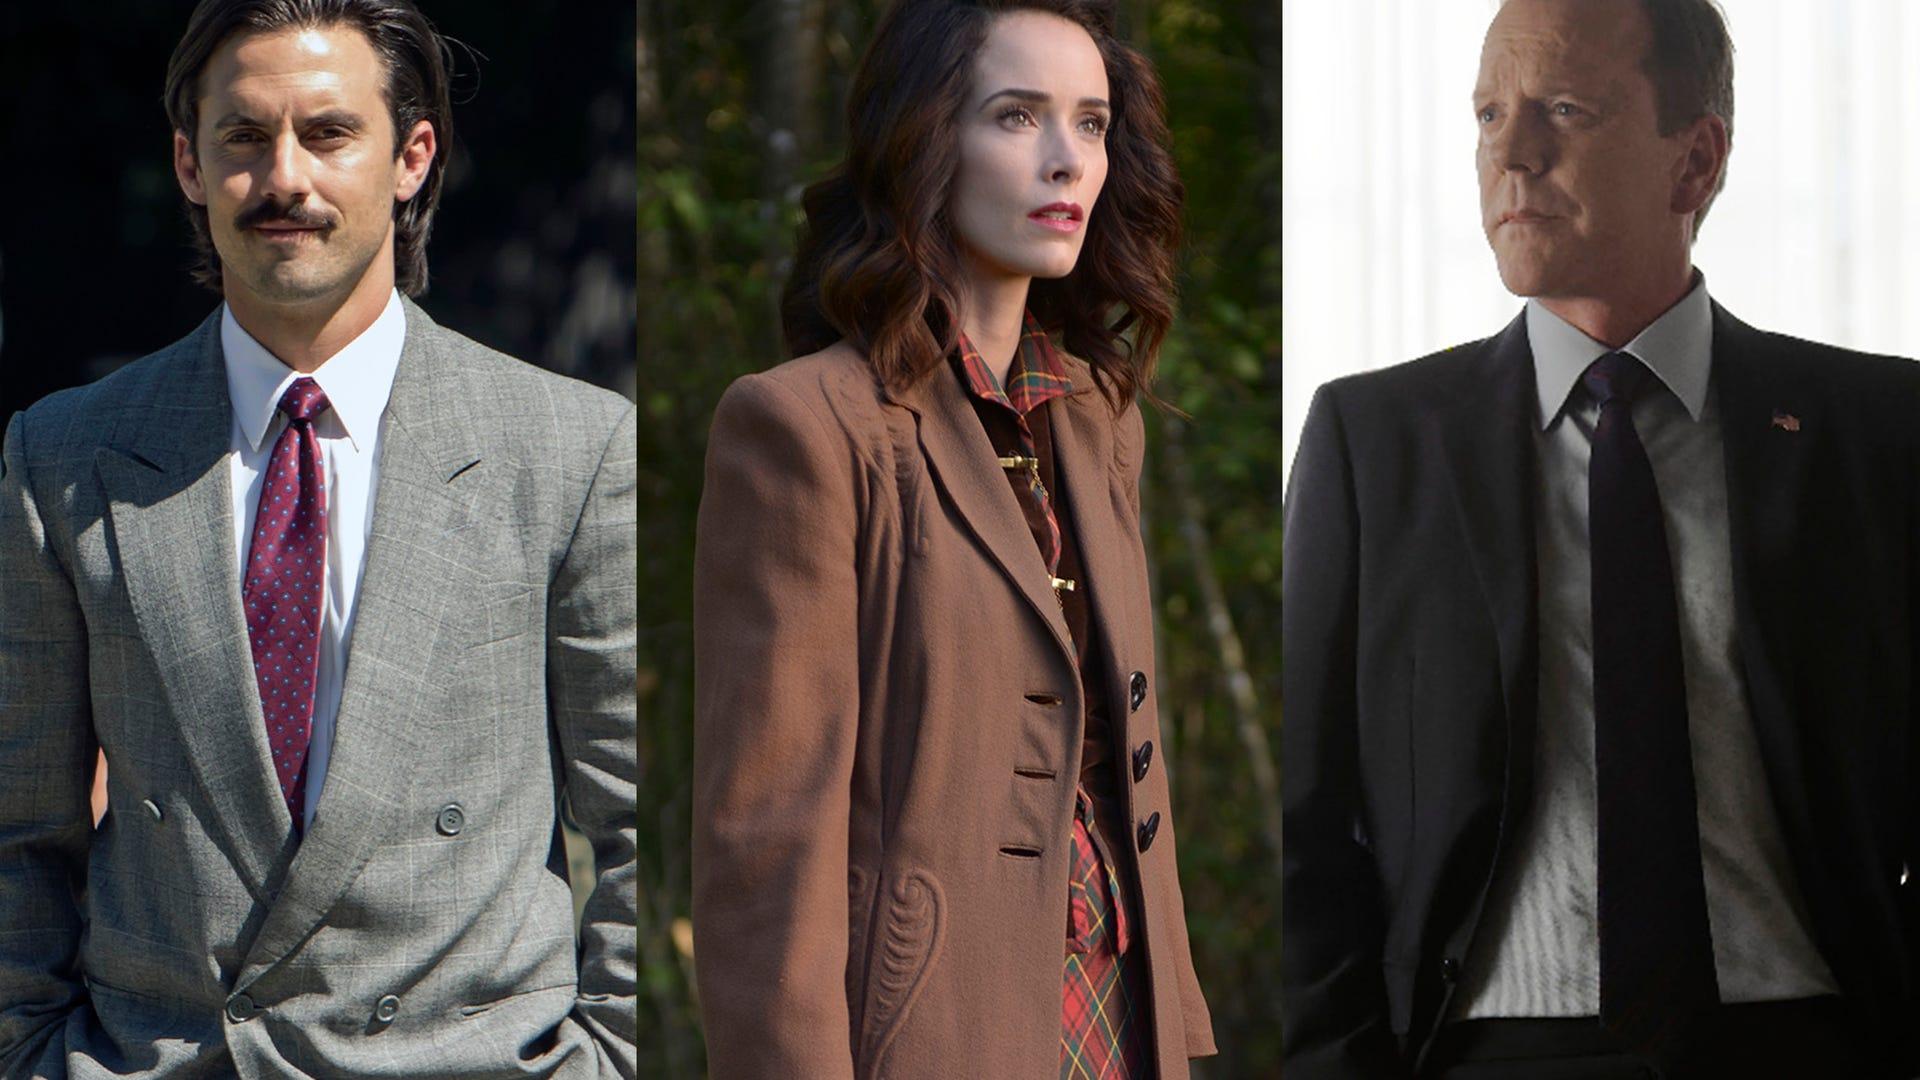 Milo Ventimiglia, This Is Us; Abigail Spencer, Timeless; Kiefer Sutherland, Designated Survivor